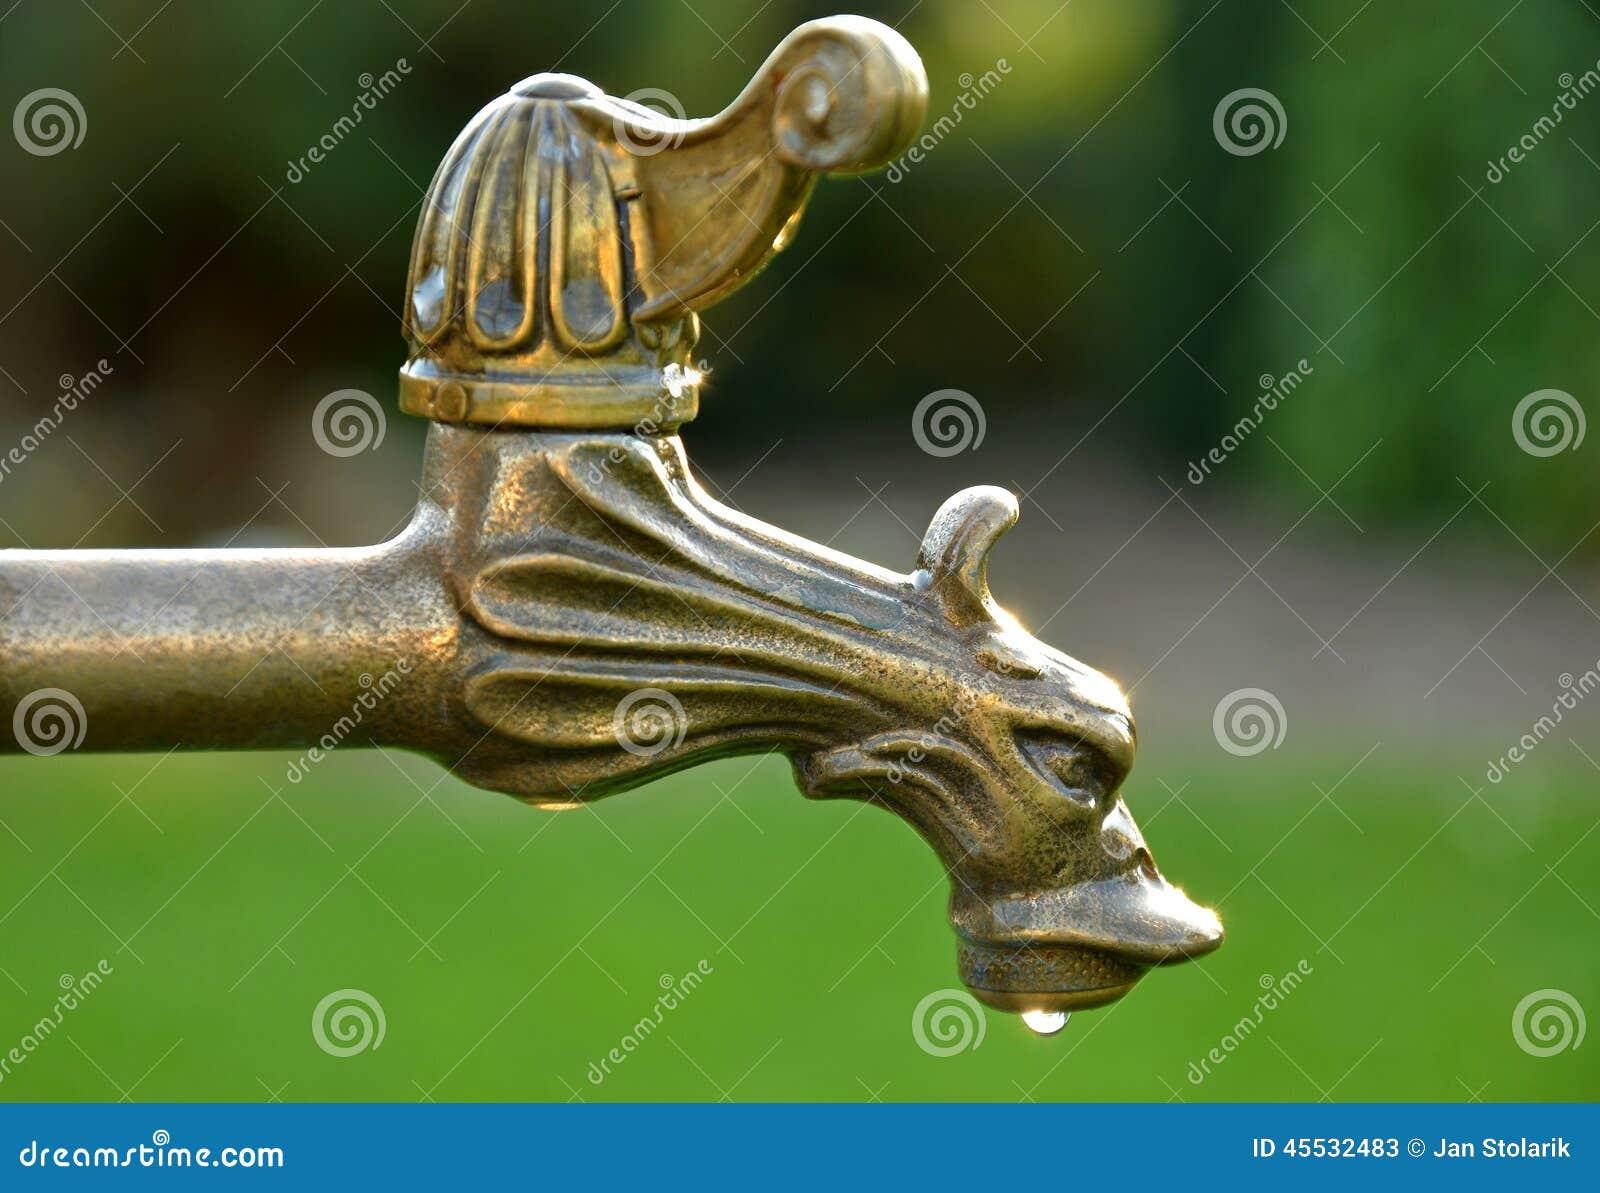 Decorative Vintage Brass Tap Water Stock Photo Image